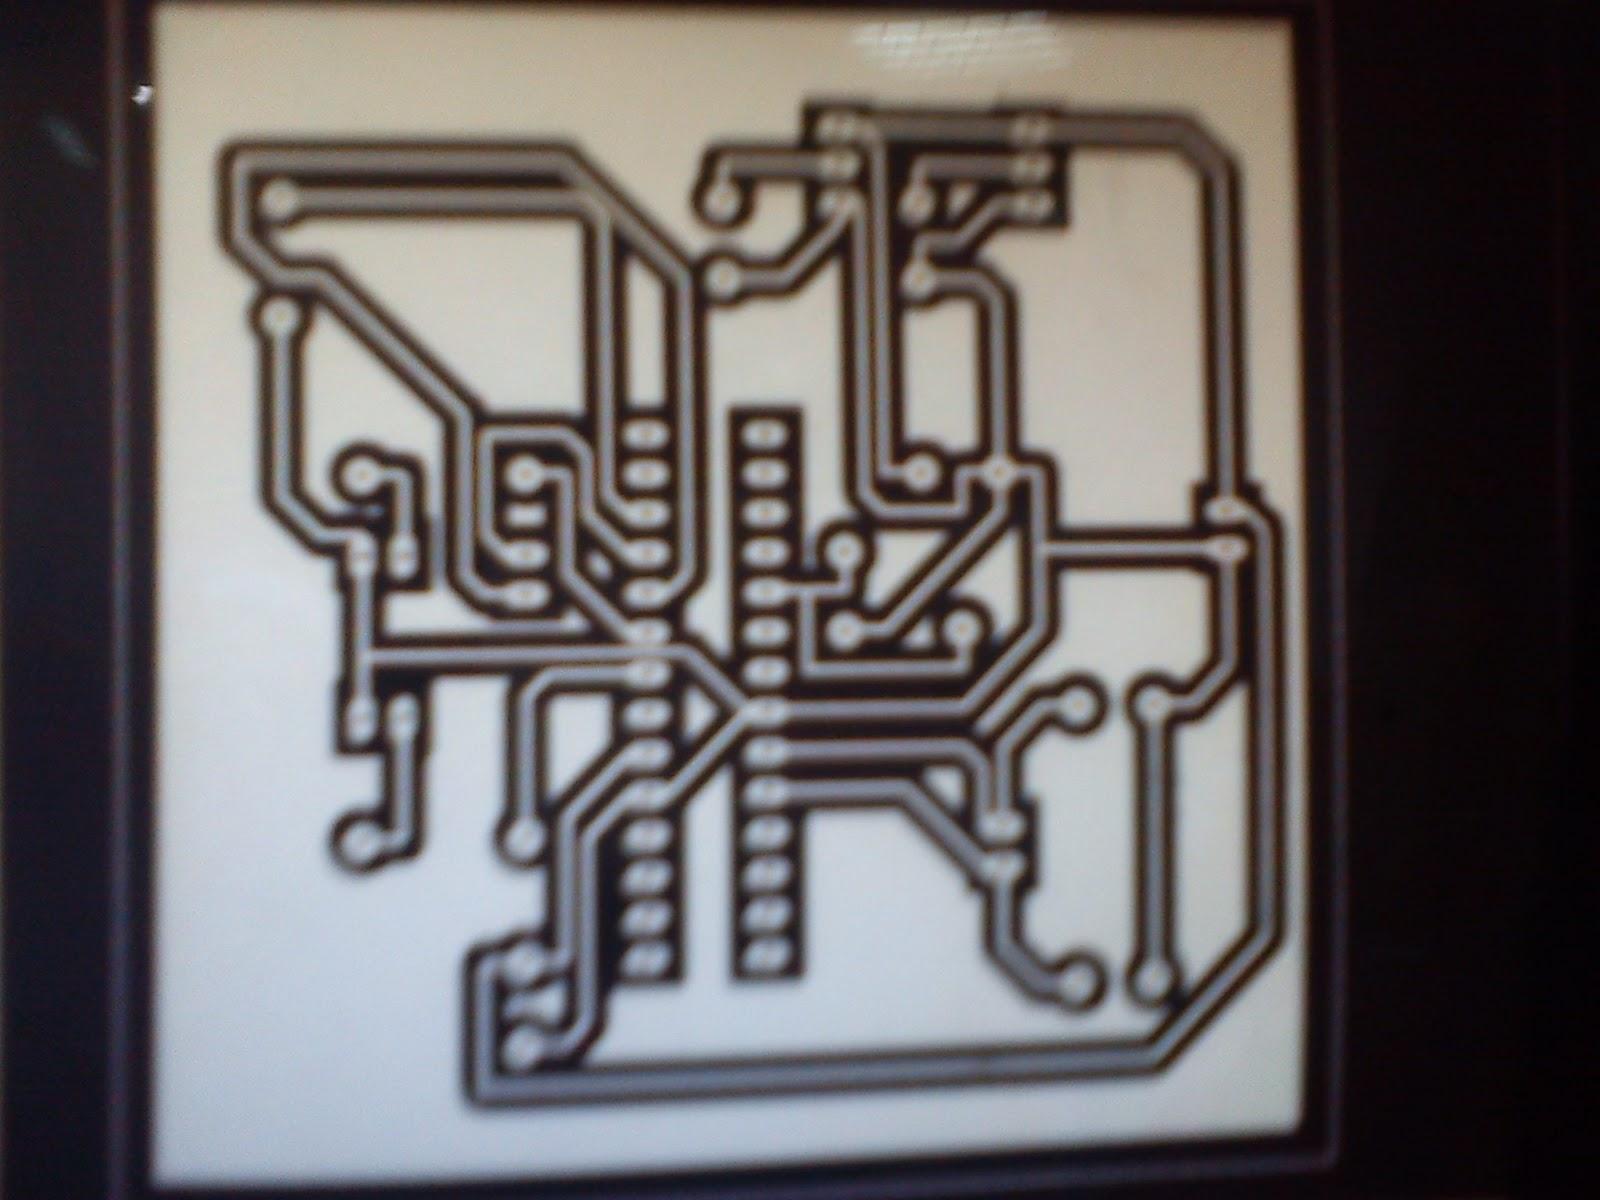 Figure 1 Assembled Hamuro Running Led Circuit